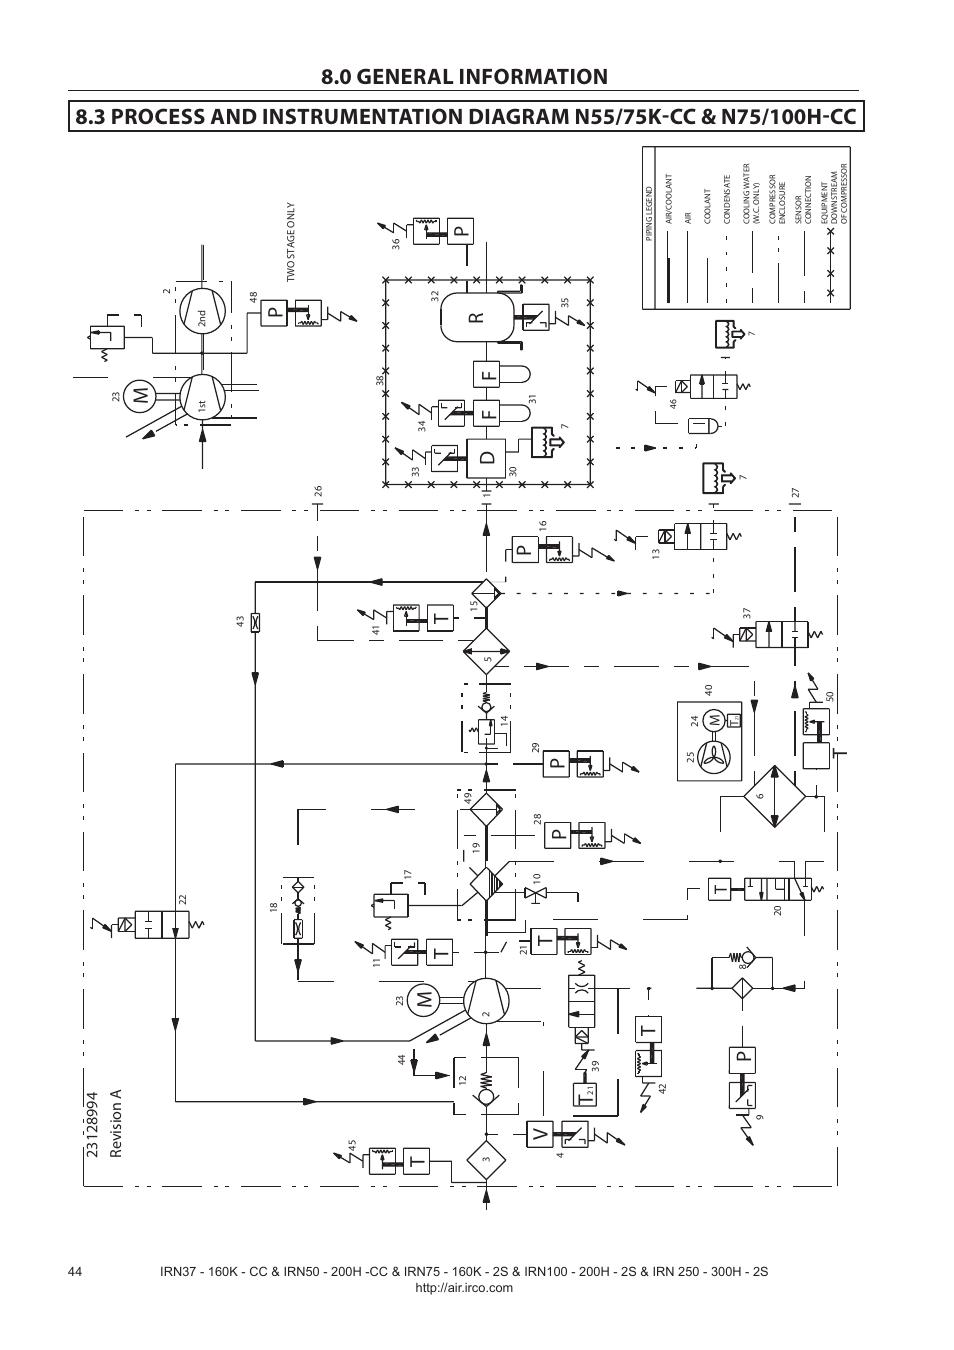 Ingersoll Rand Wiring Diagram